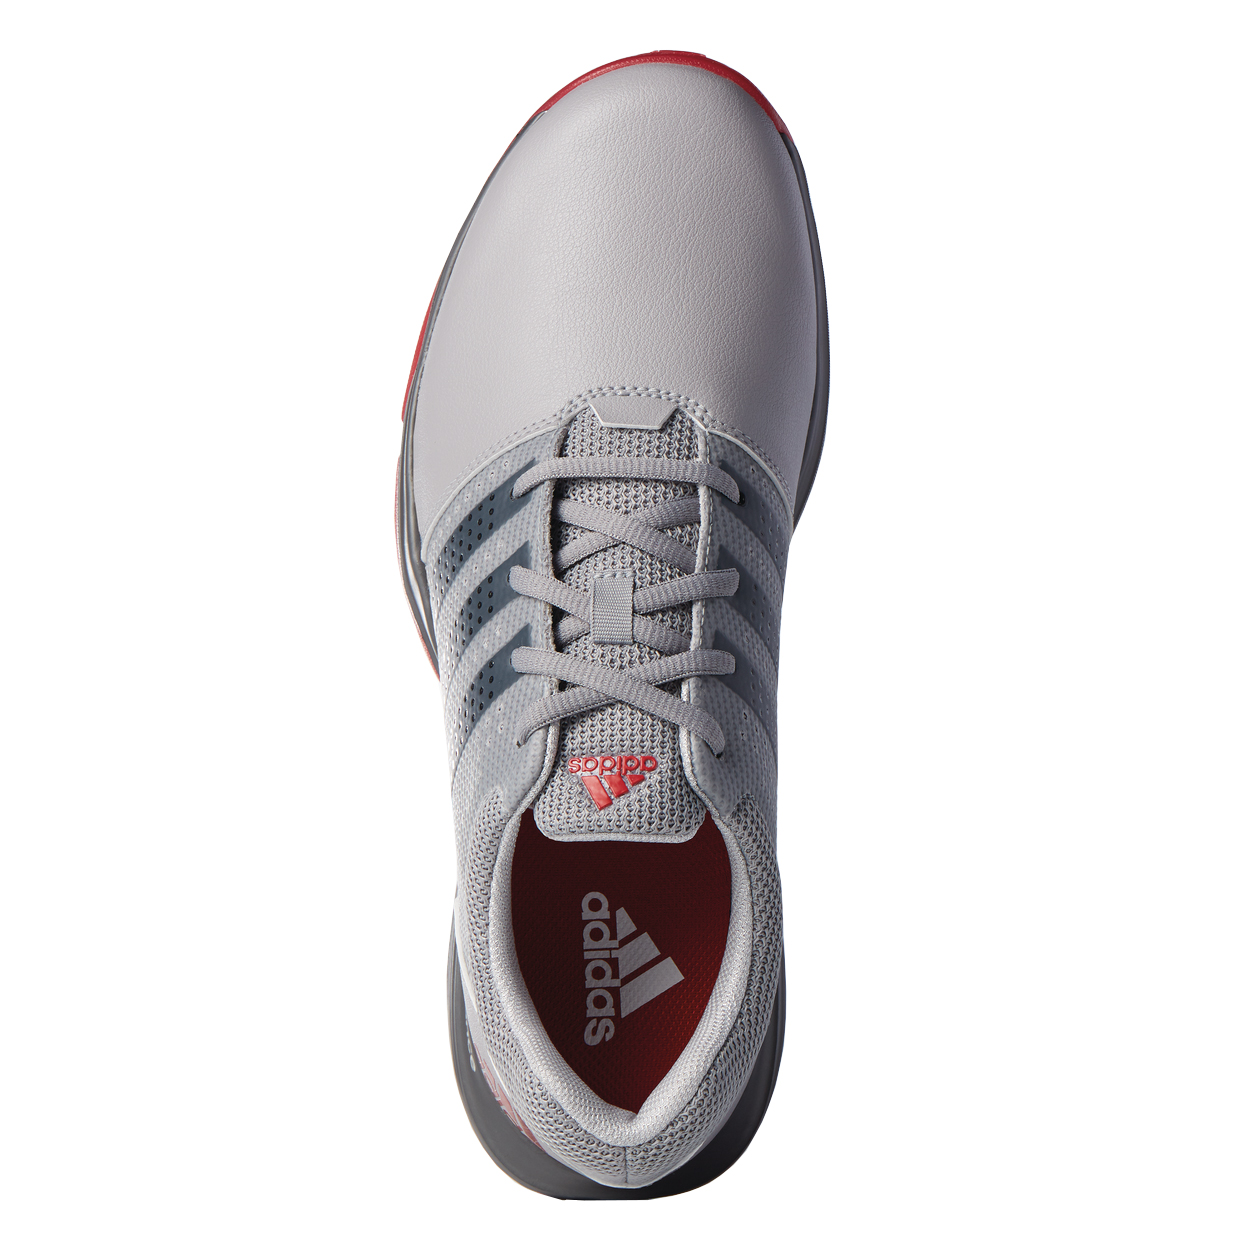 Adidas-Men-039-s-360-Traxion-Golf-Shoes thumbnail 11